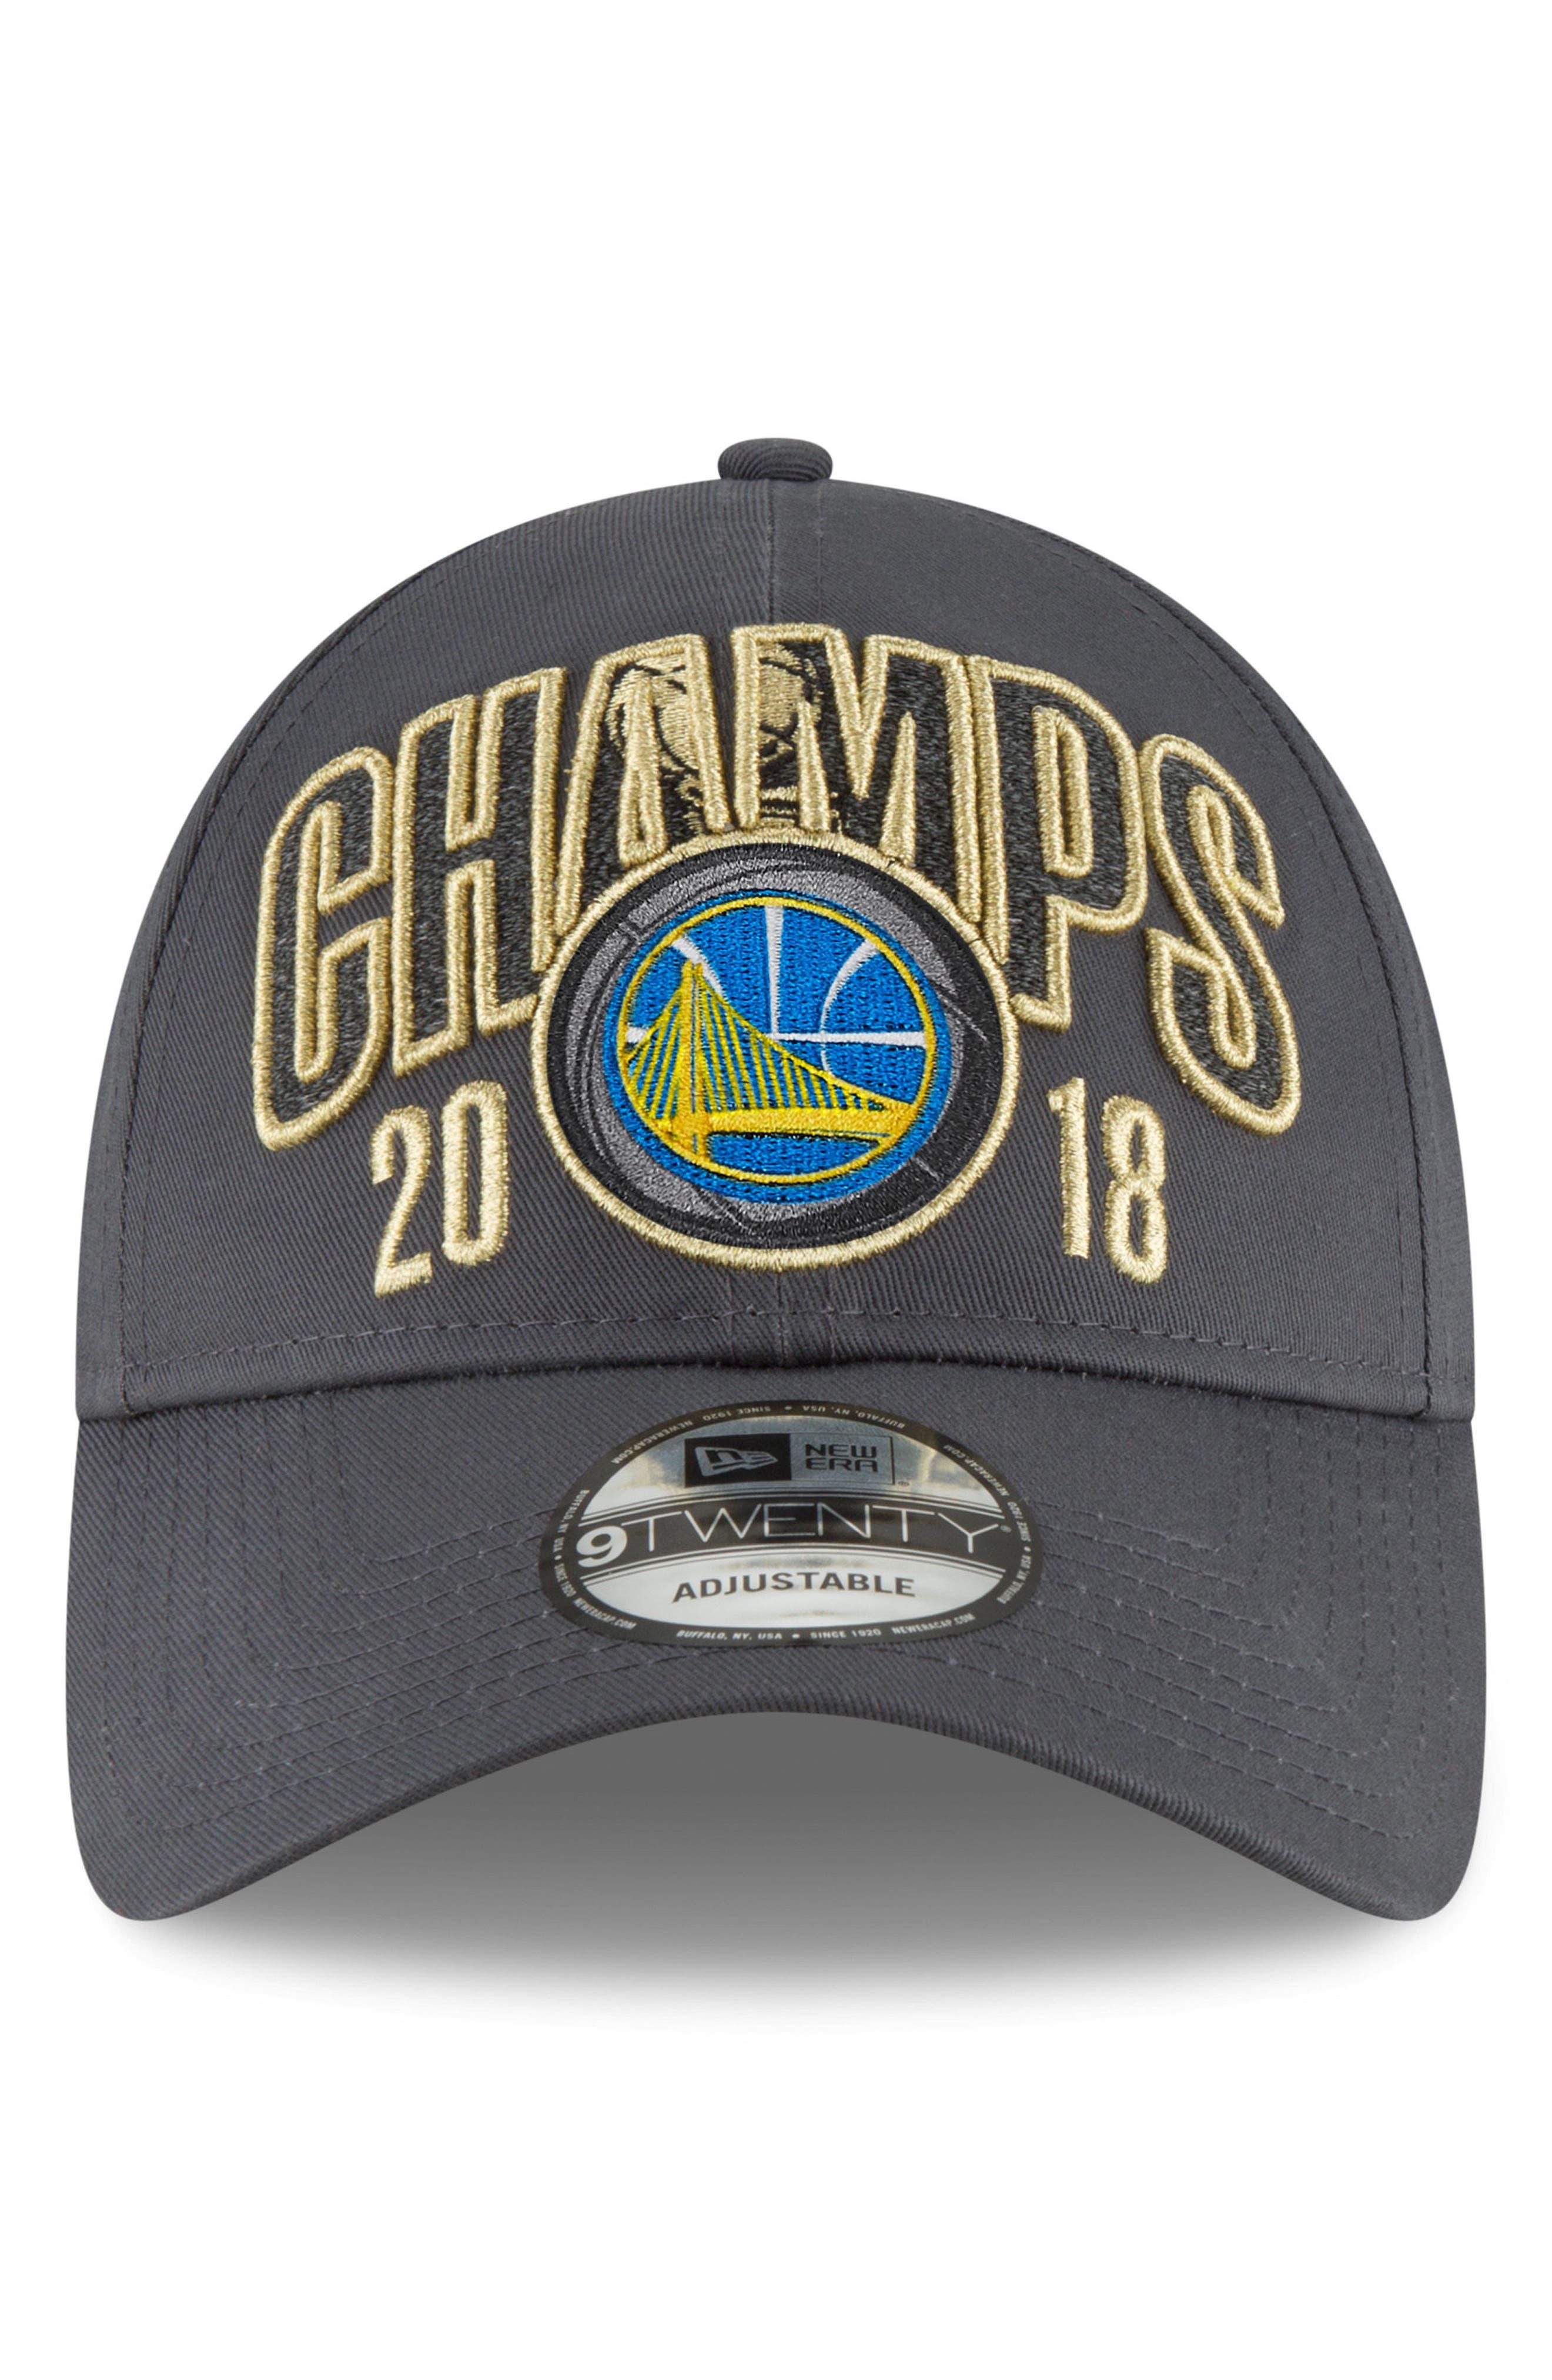 2018 NBA Champions - Golden State Warriors 9Twenty Baseball Cap,                             Main thumbnail 1, color,                             GOLDEN STATE WARRIORS